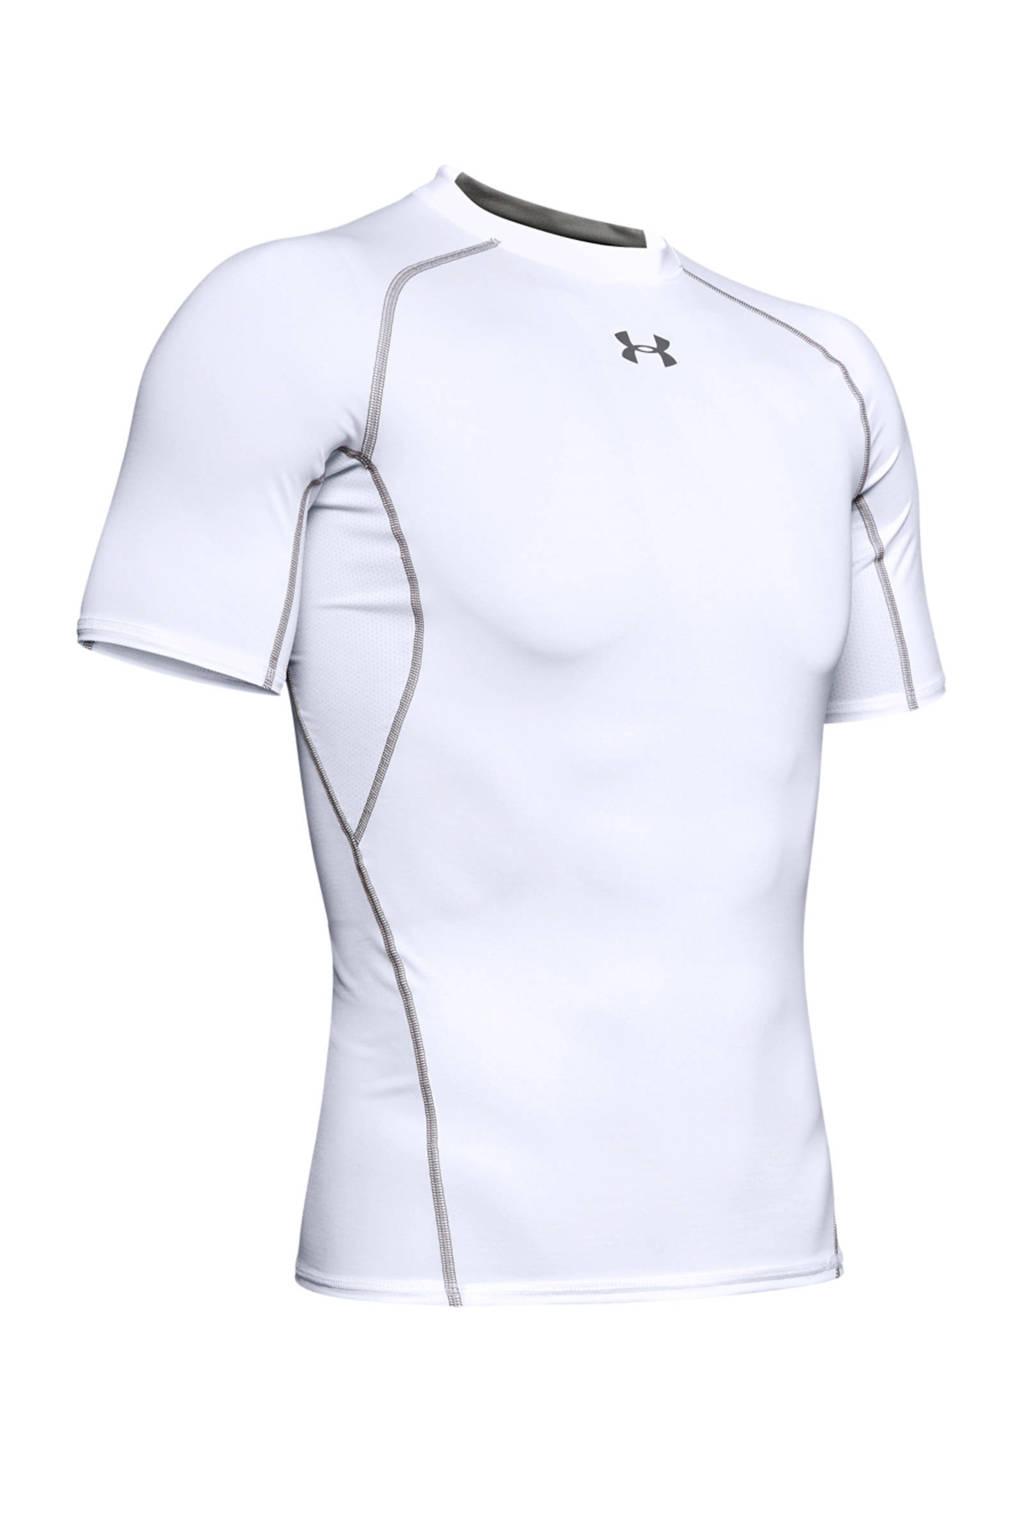 Under Armour   sport T-shirt, Wit/grijs